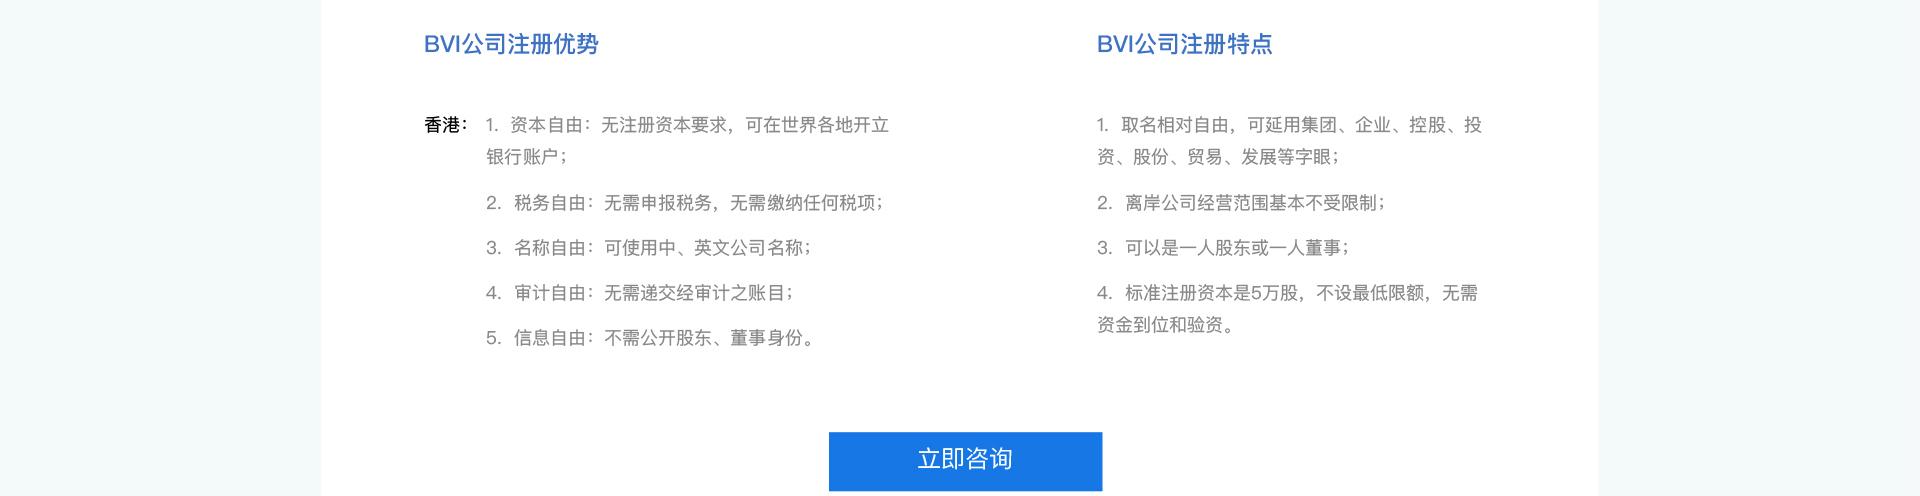 BVI公司注册_03.jpg